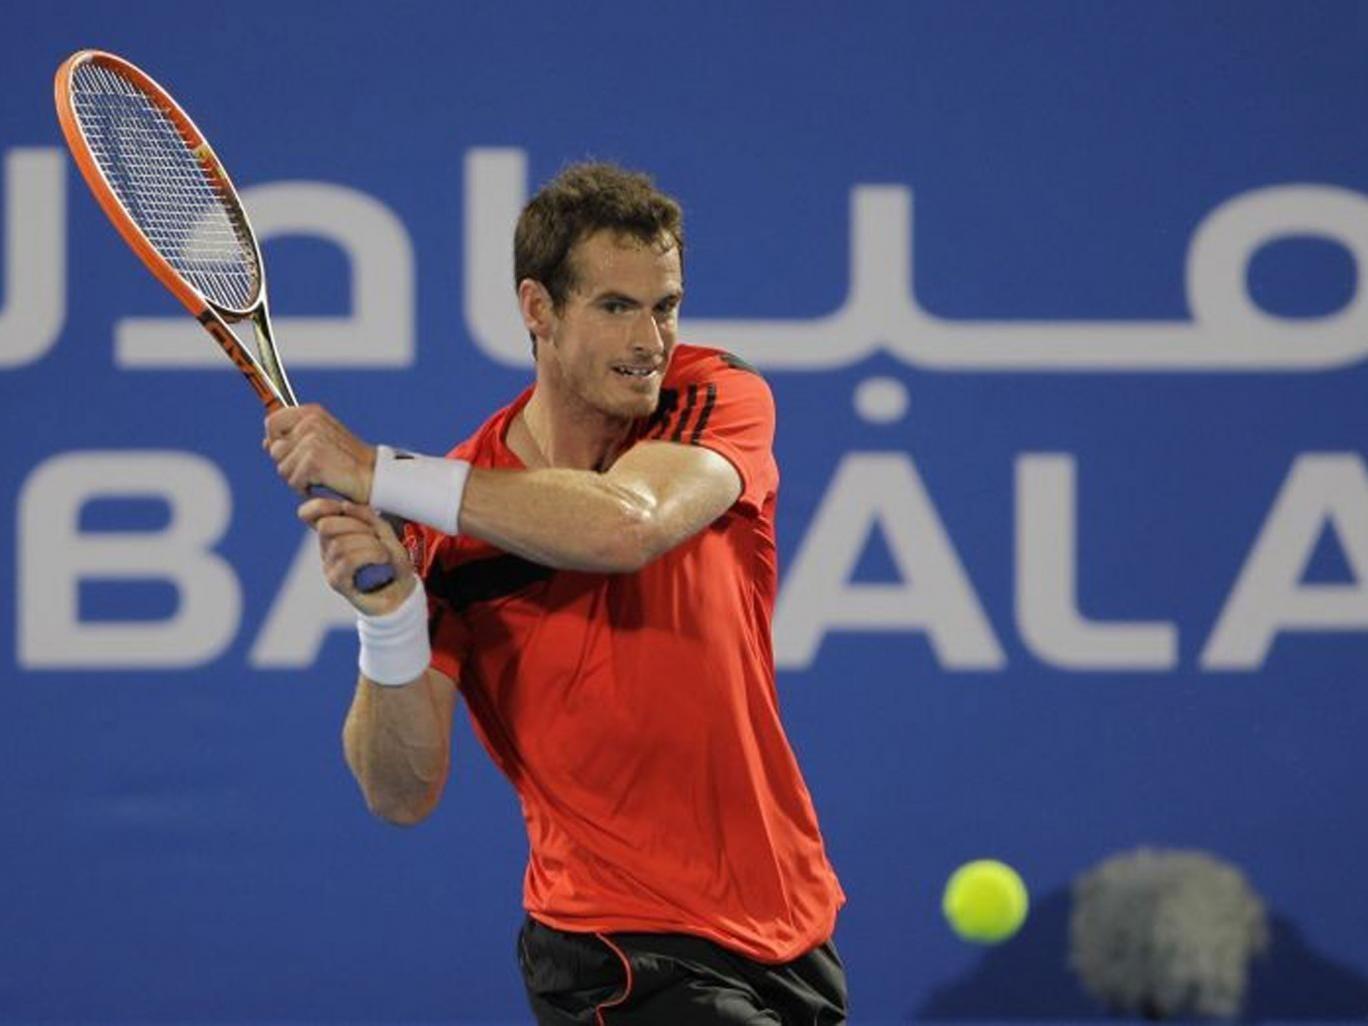 That's Andy: Murray has faced Jo-Wilfried Tsonga and Stanislas Wawrinka ahead of the Qatar Open